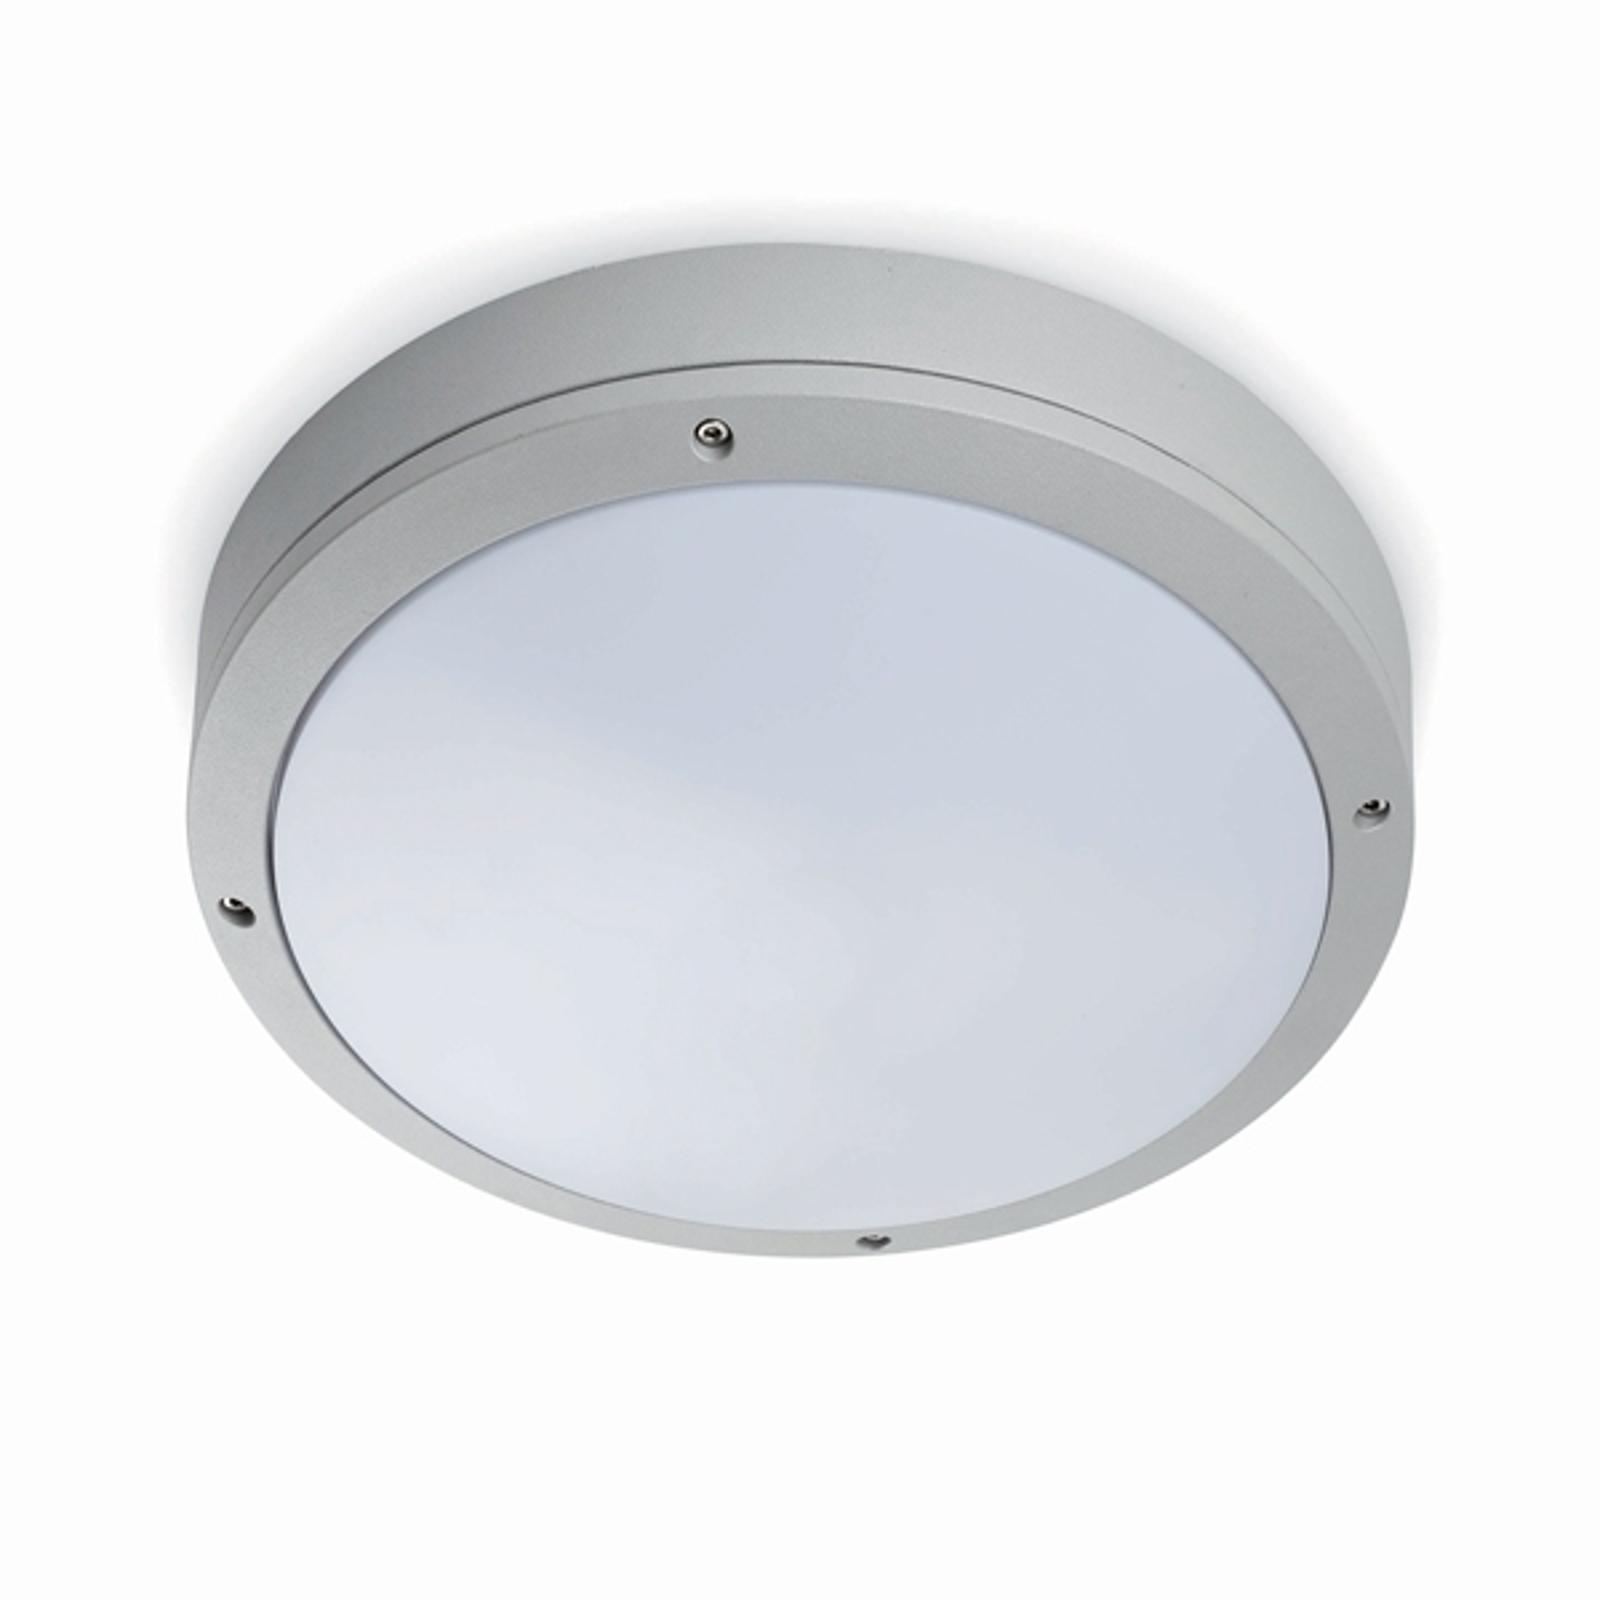 Enkel Yen udendørs loftlampe